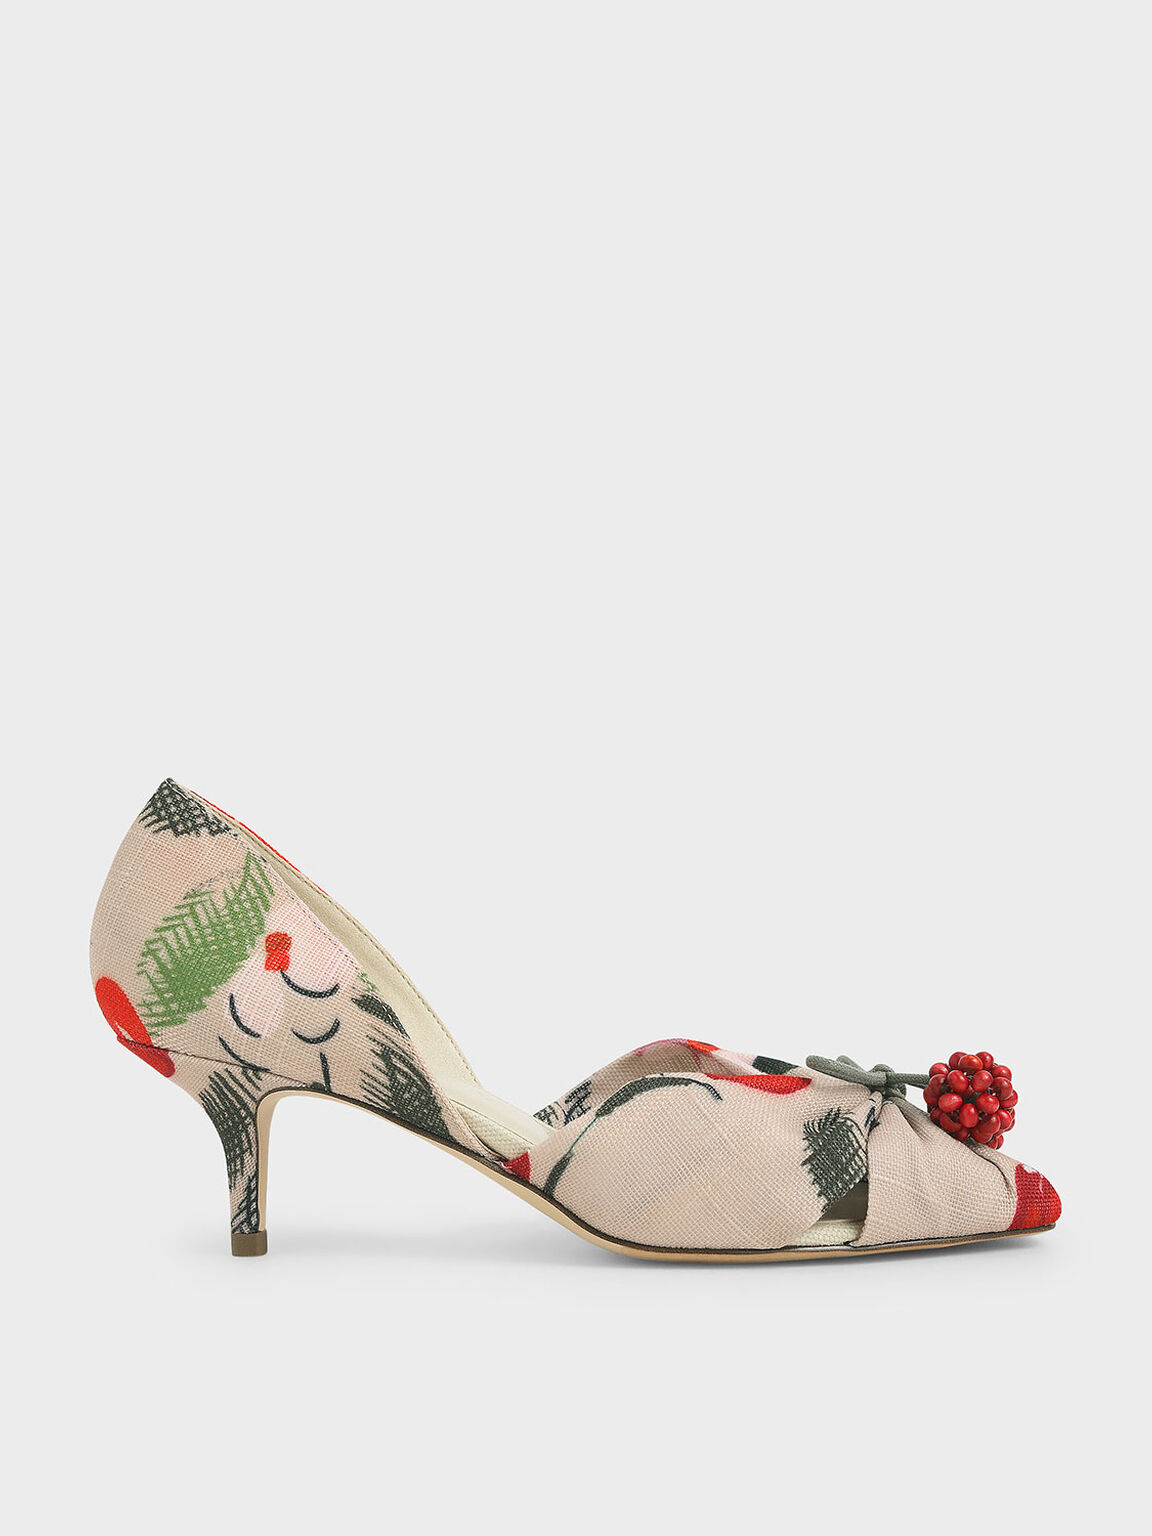 Cherry Embellished Peep-Toe D'Orsay Pumps, Multi, hi-res